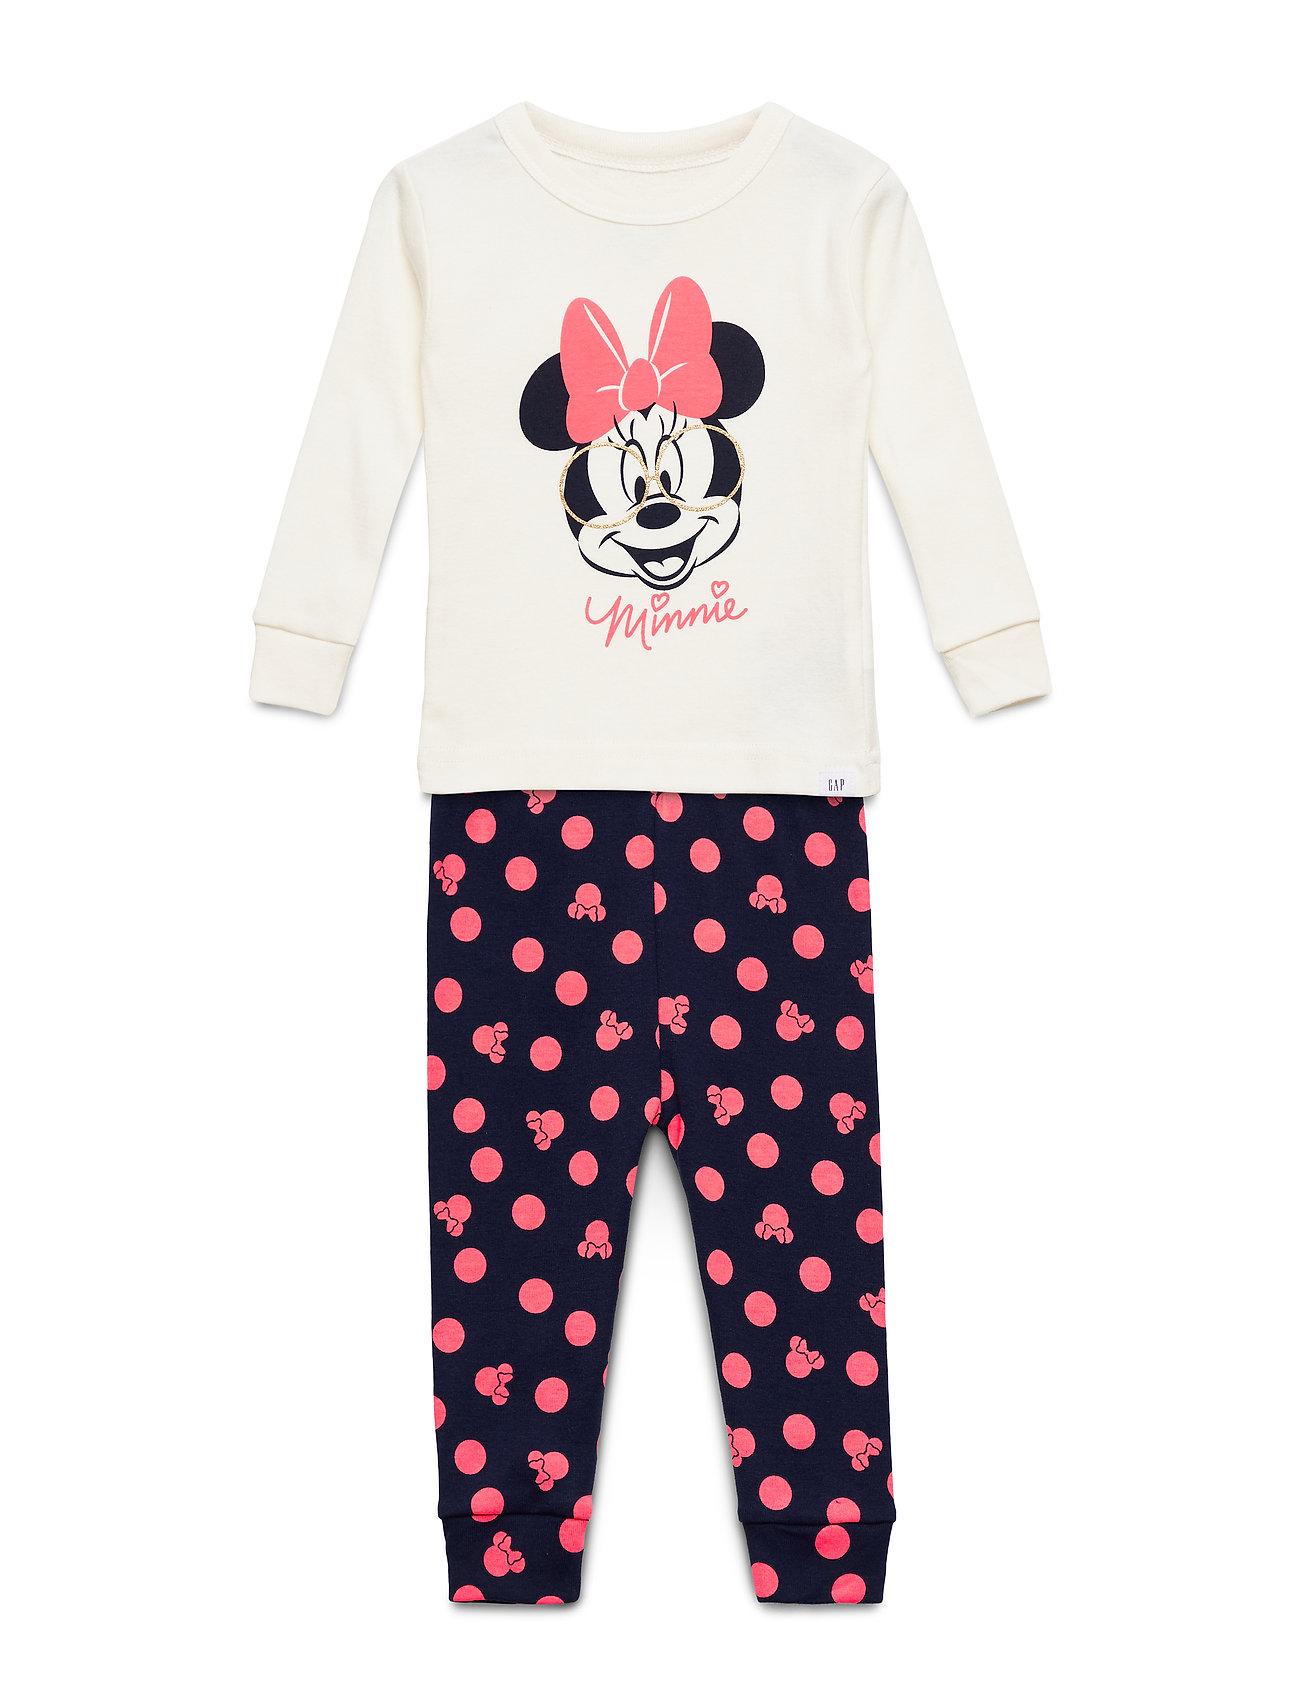 GAP babyGap | Disney Minnie Mouse PJ Set - SNOWFLAKE MILK